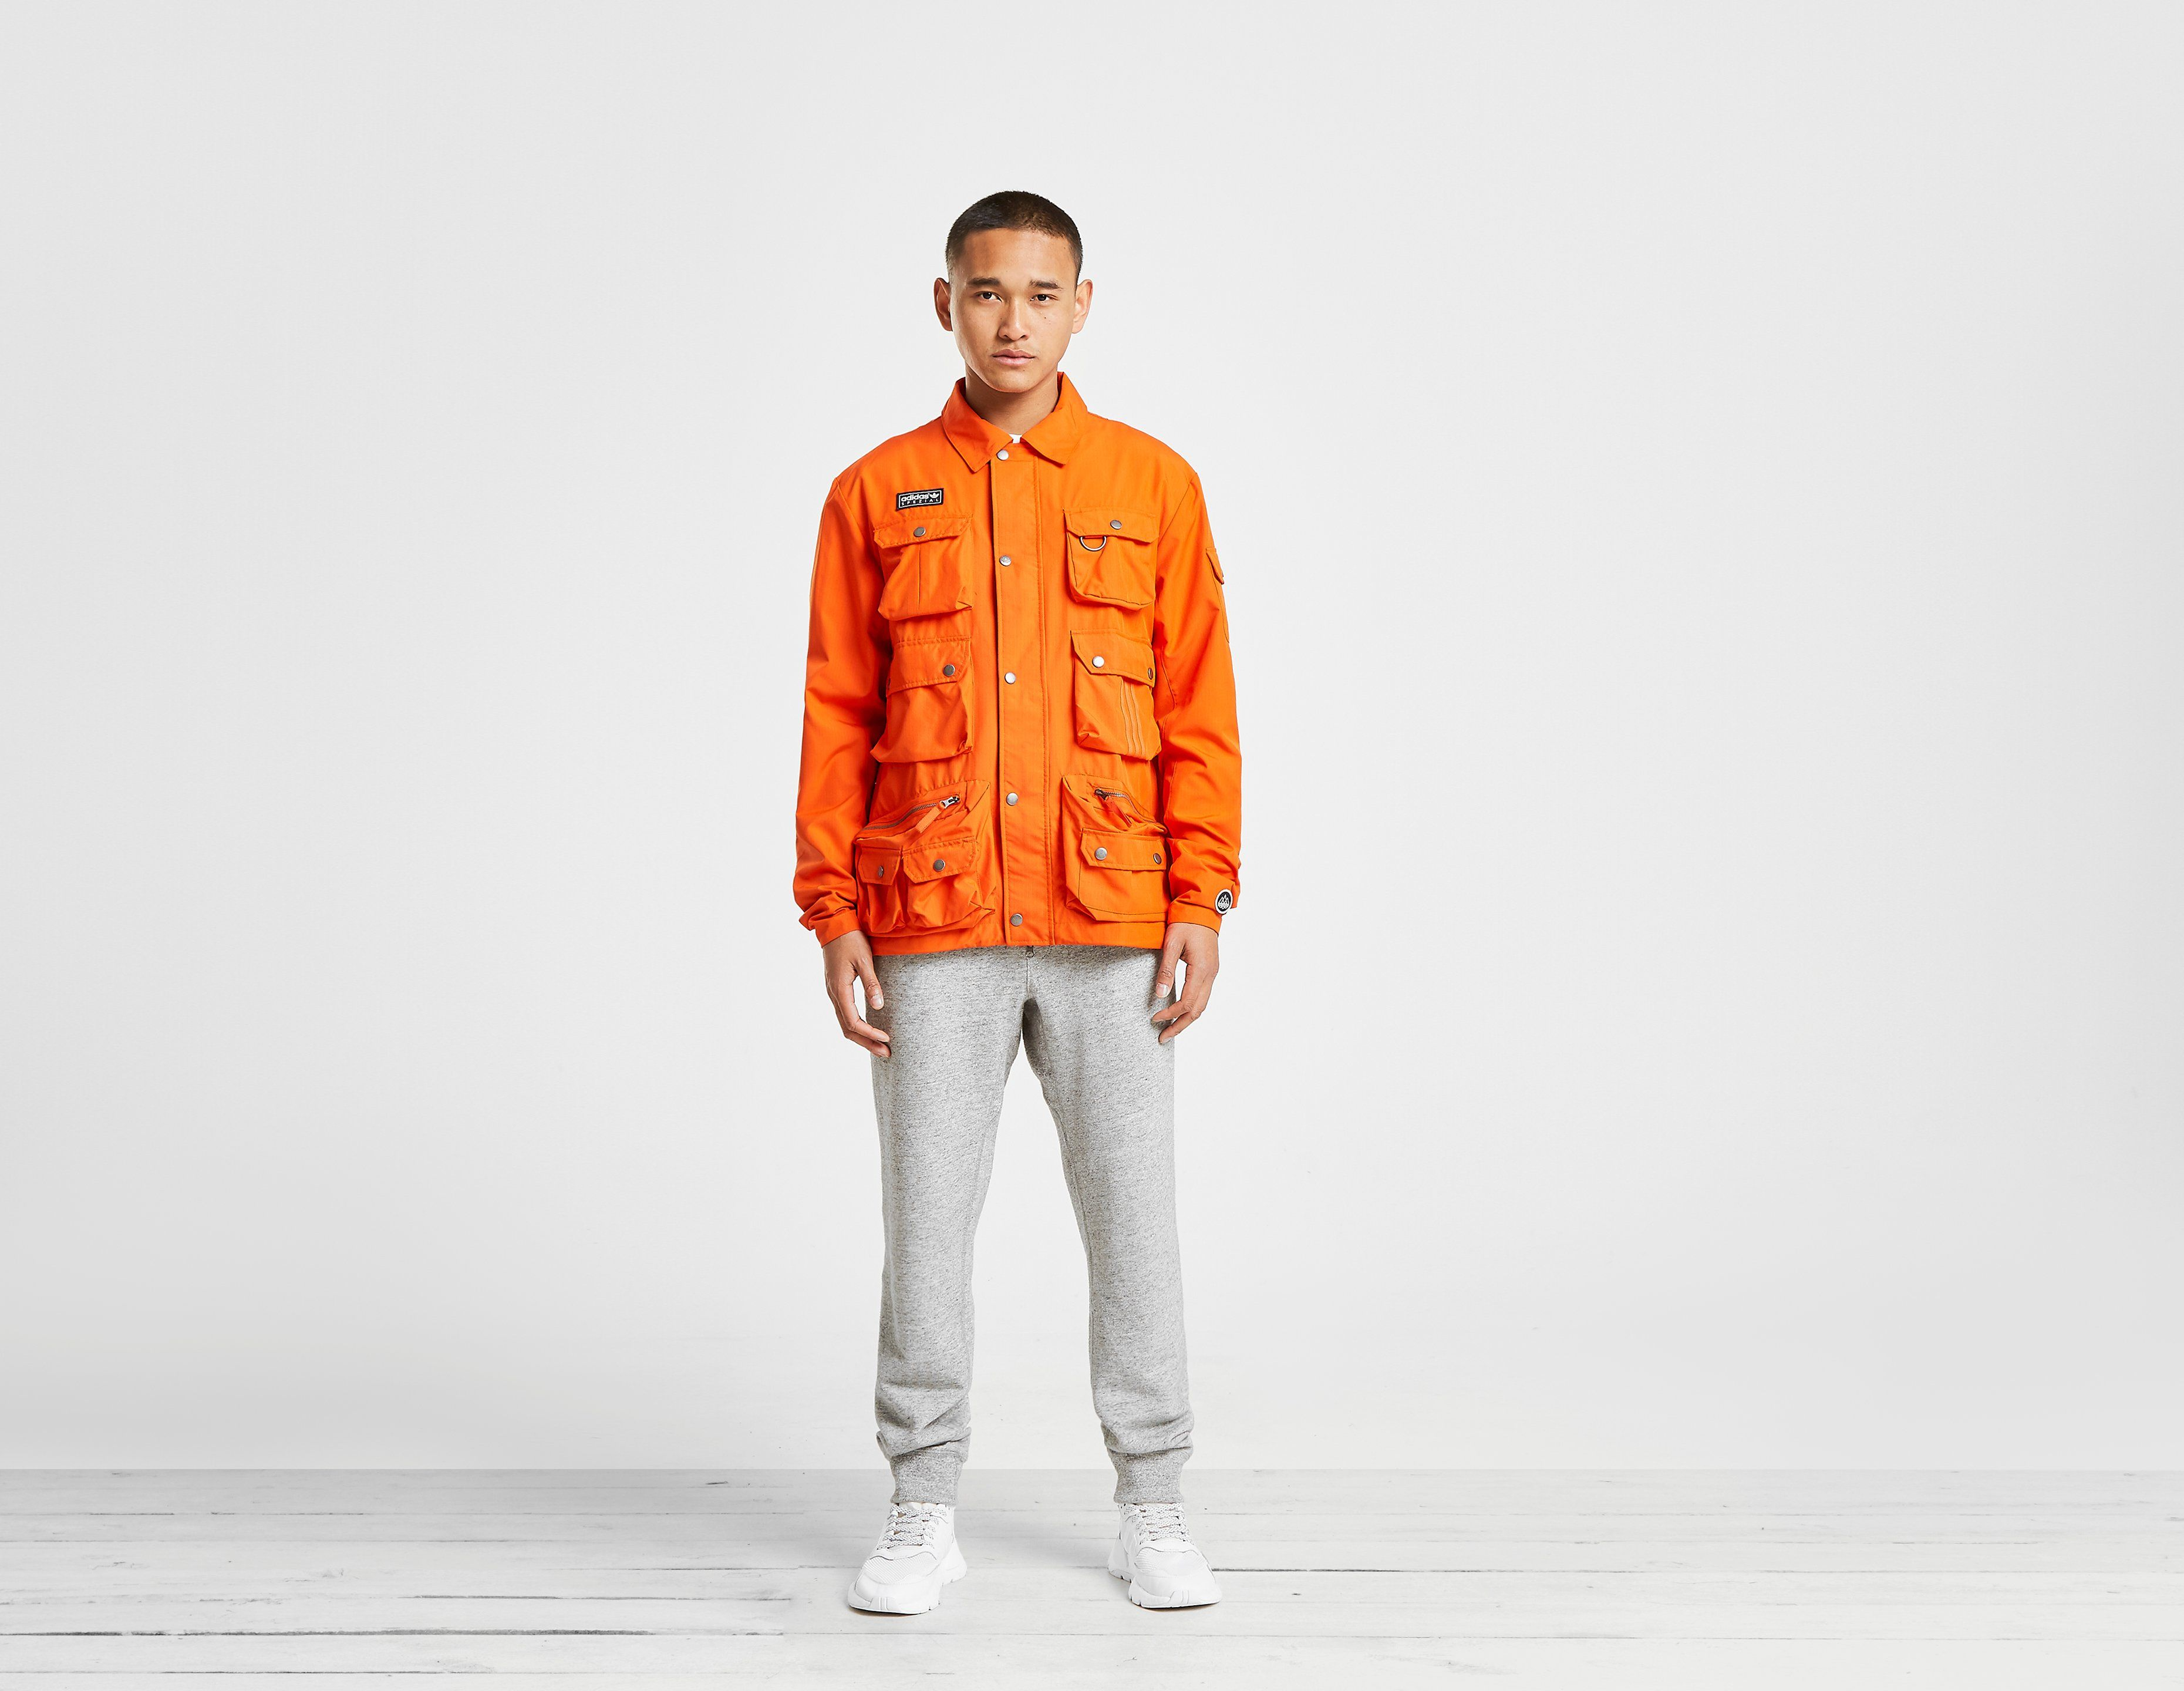 adidas SPEZIAL Wardour Jacket